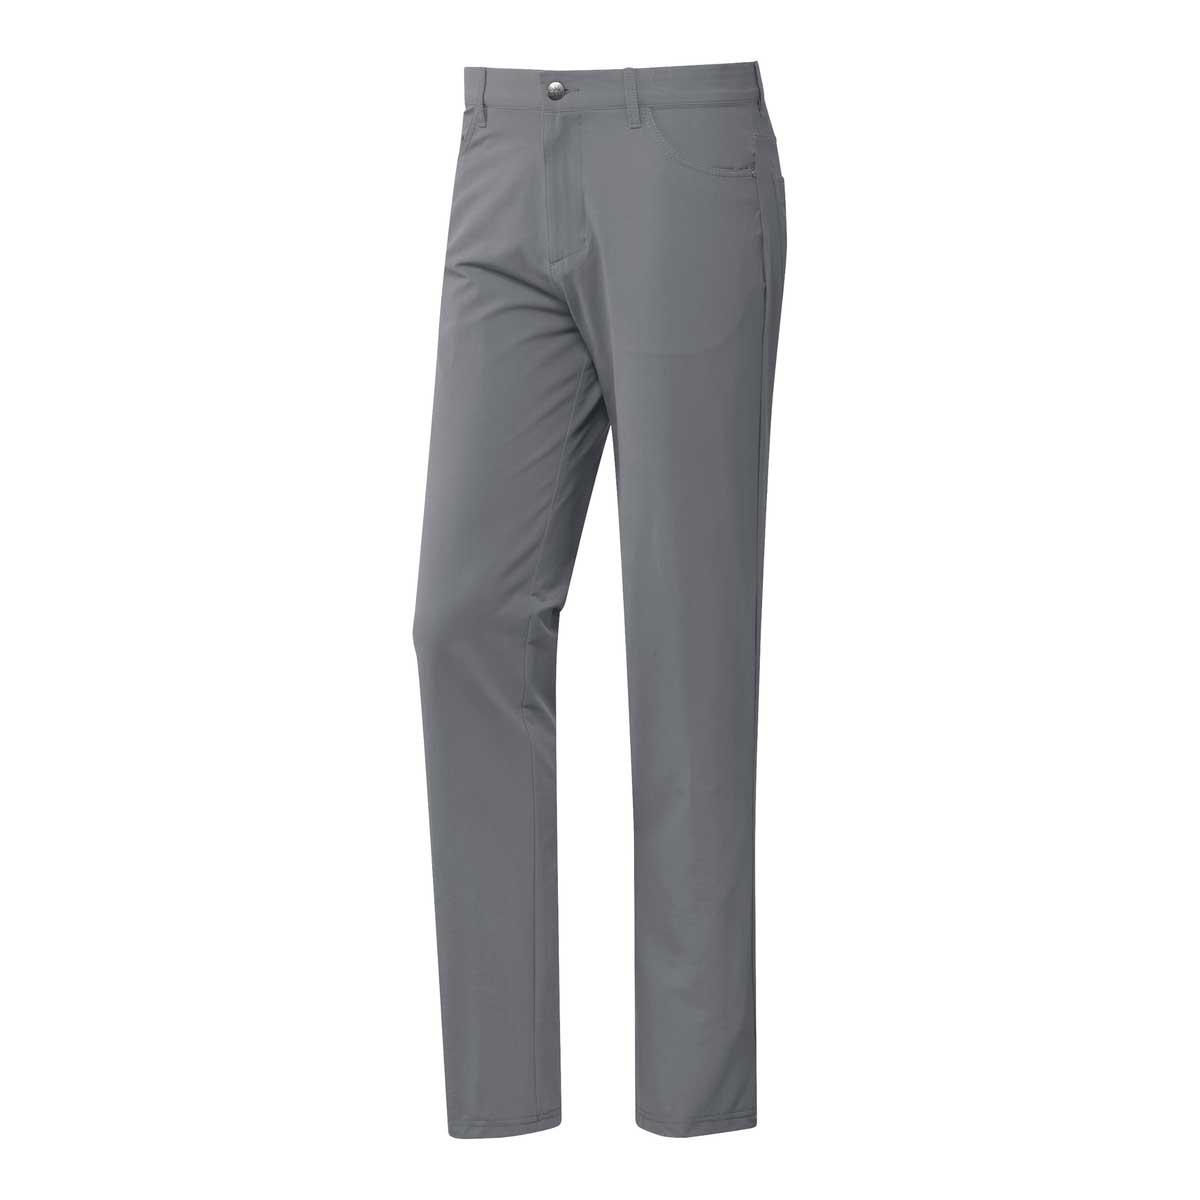 Adidas Men's Go-To Five Pocket Grey Three Pant